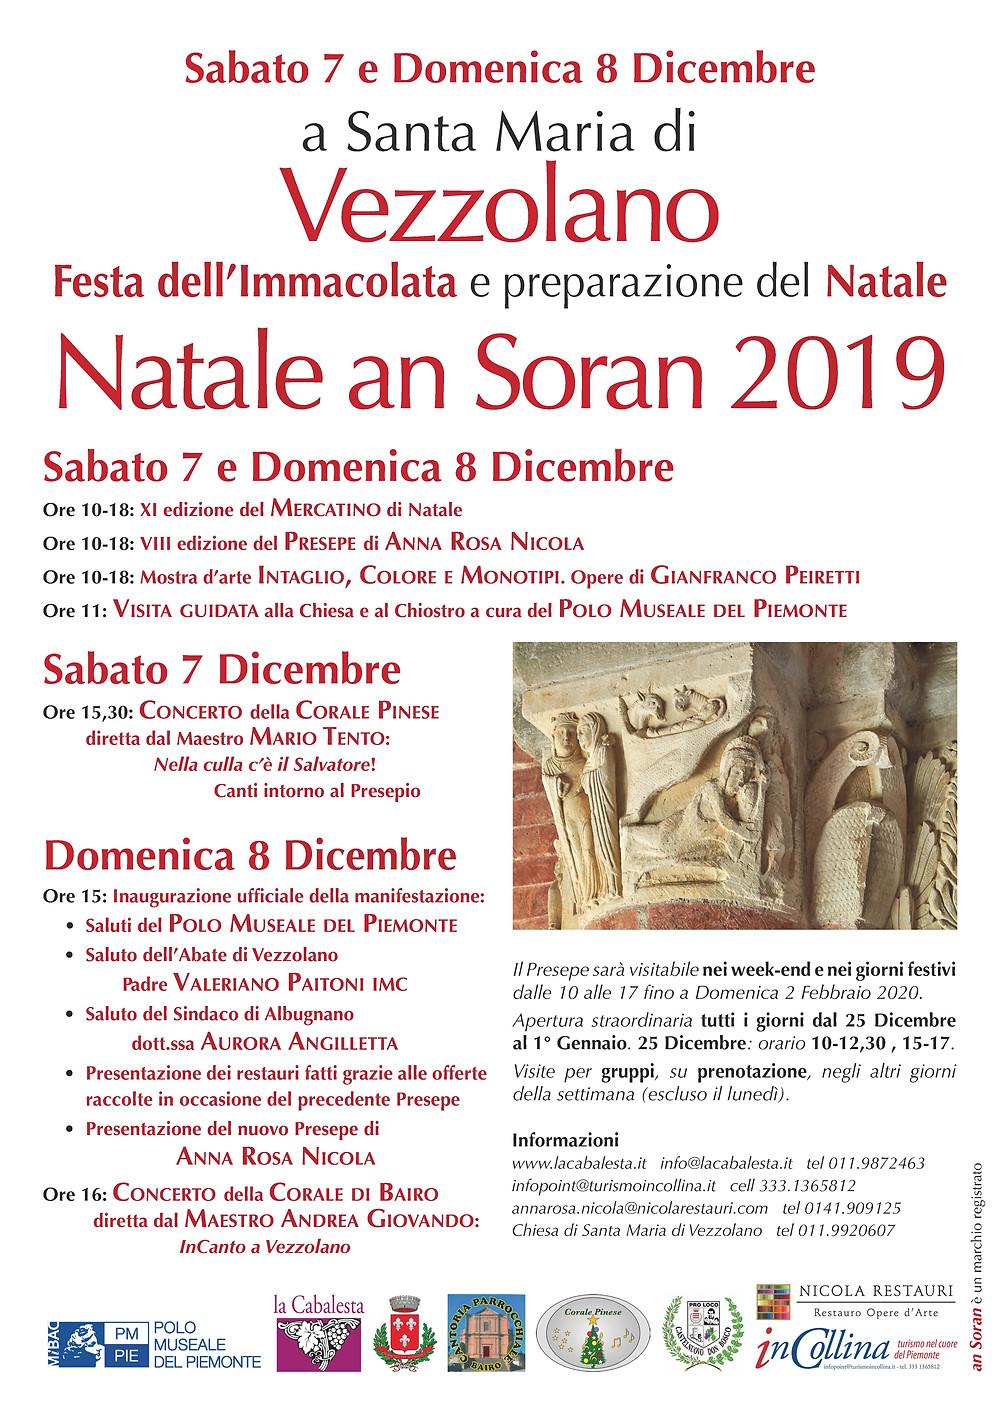 Locandina Natale an Soran 2019 - 7-8 dicembre